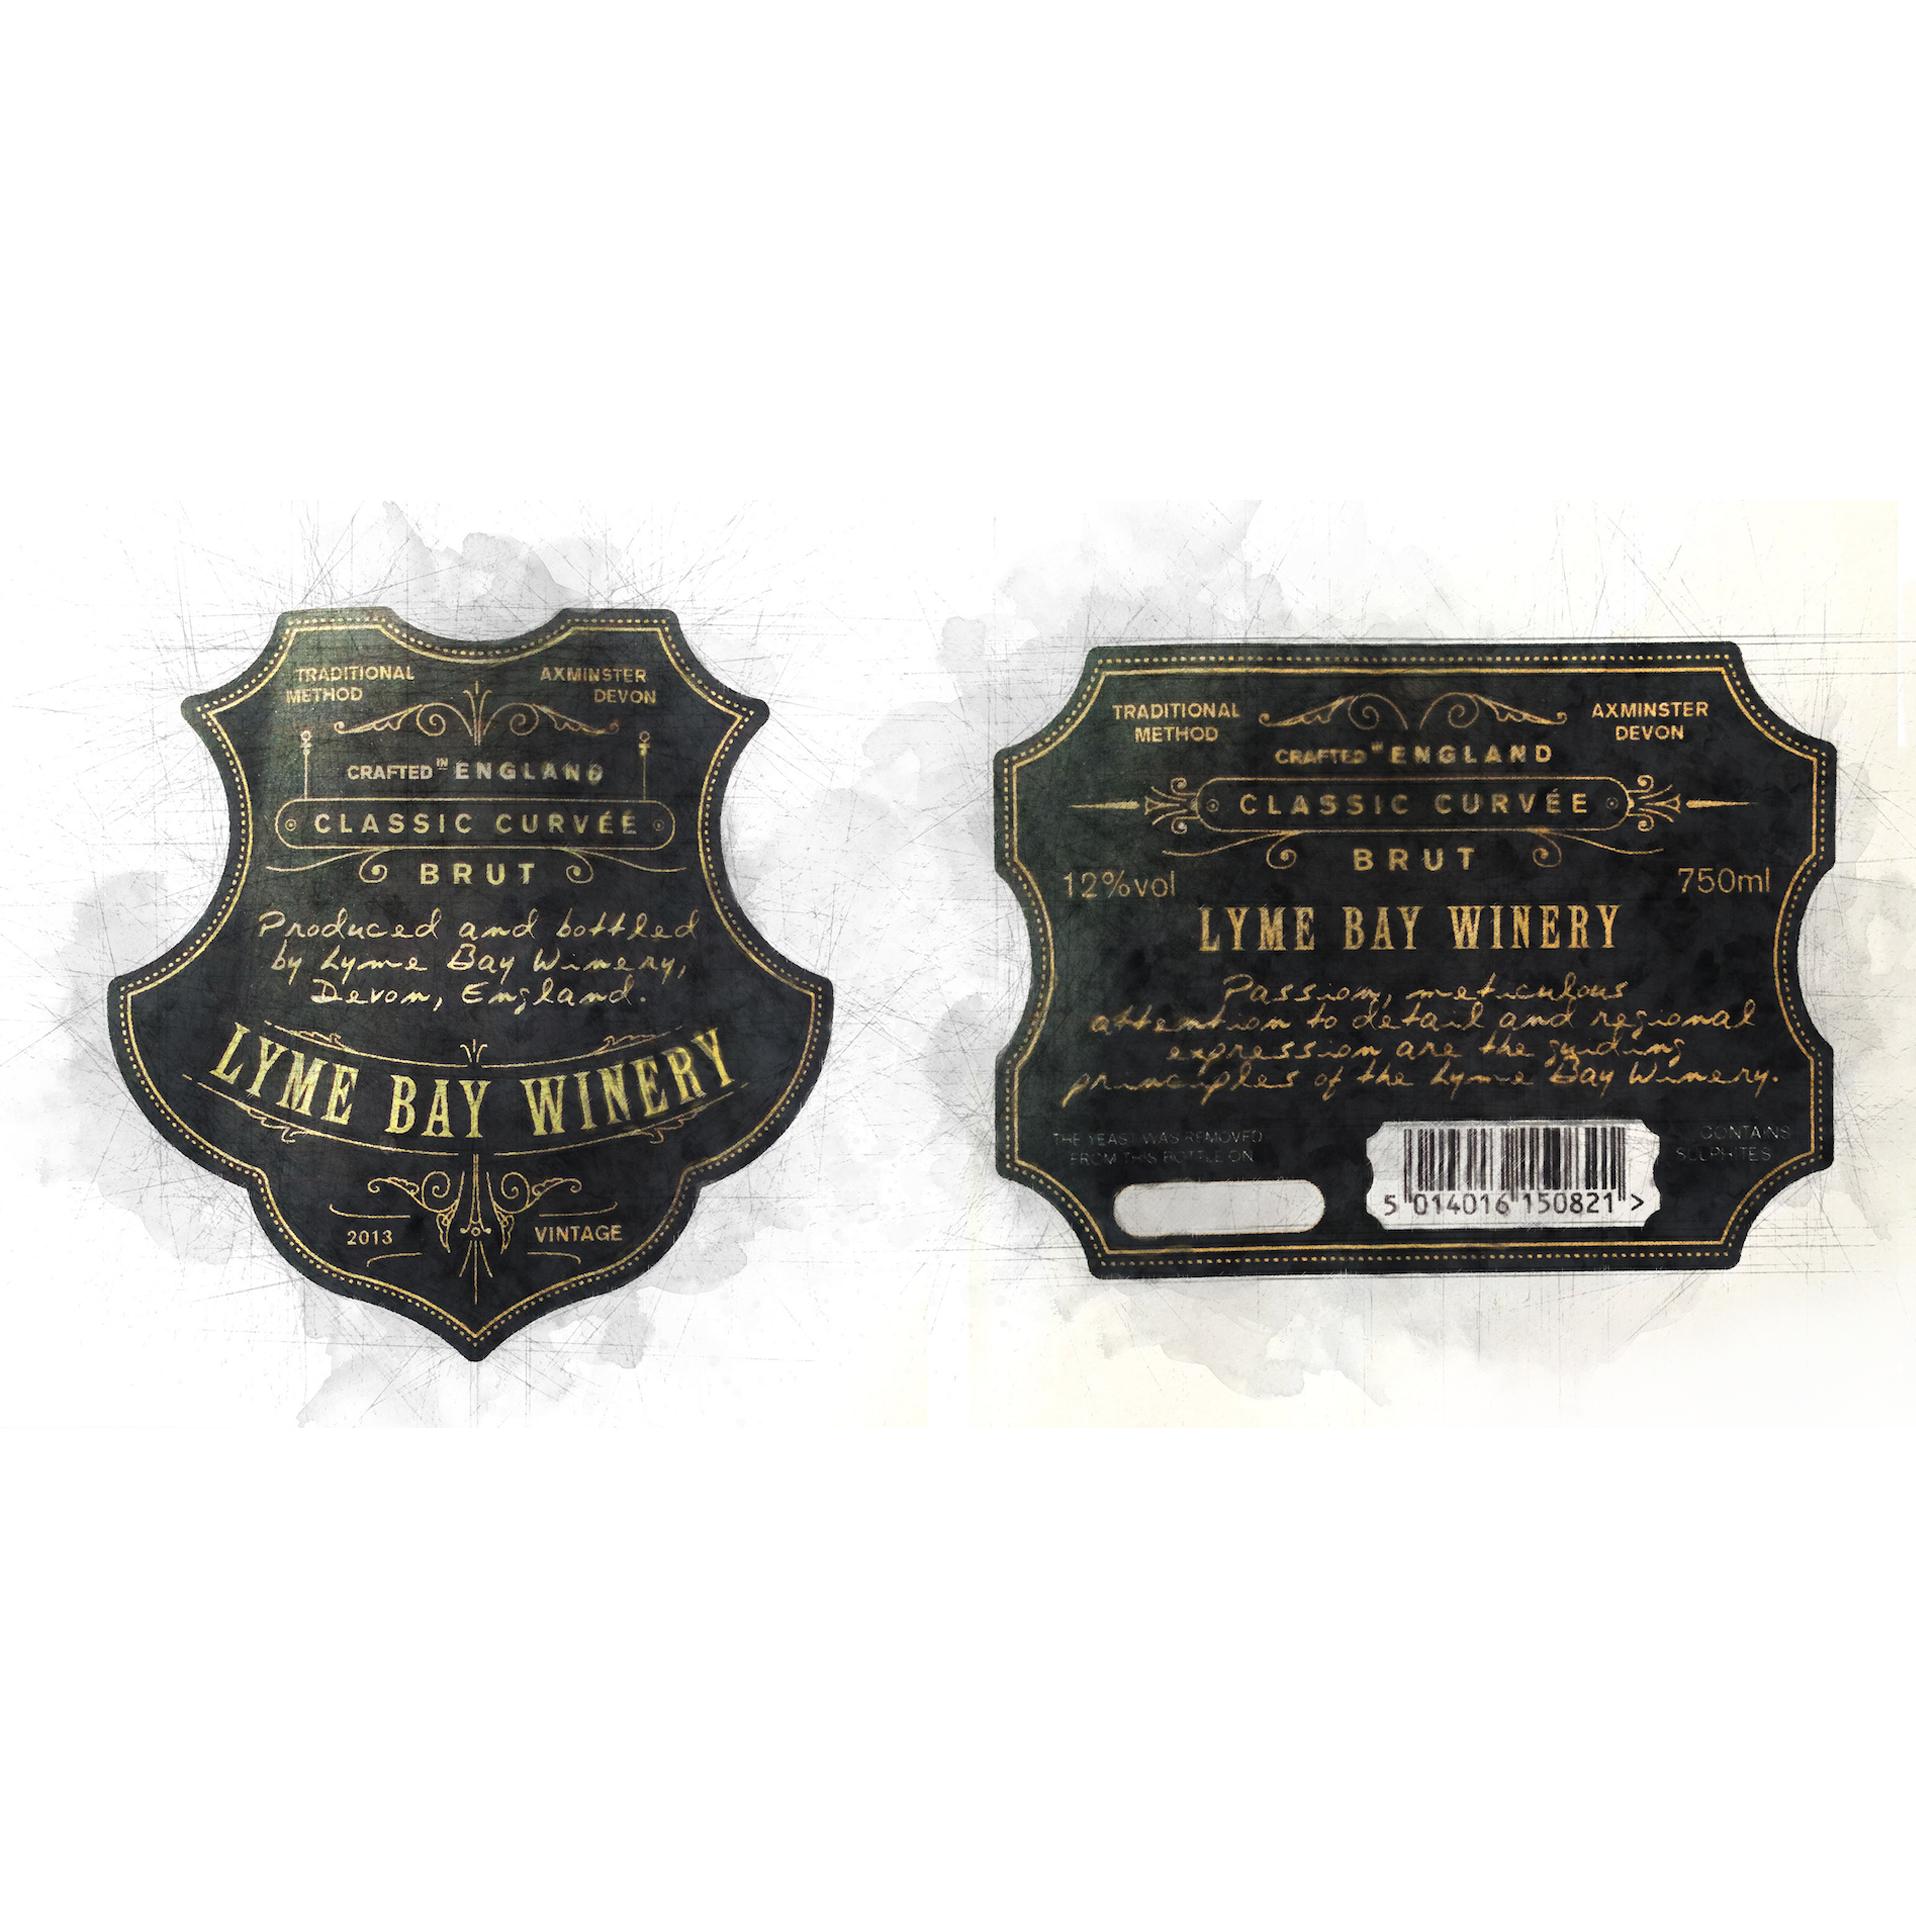 From The Archive — Development Work.@lymebaywinery.#englishsparklingwine #drawing #packaging #packagingdesign #labeldesign #branding #graphicdesign #label #foil #deboss #wine #winetasting #wines #englishwine #vintage #vinyards #winenot #winelife #england #British #markers #art #sparklingwine